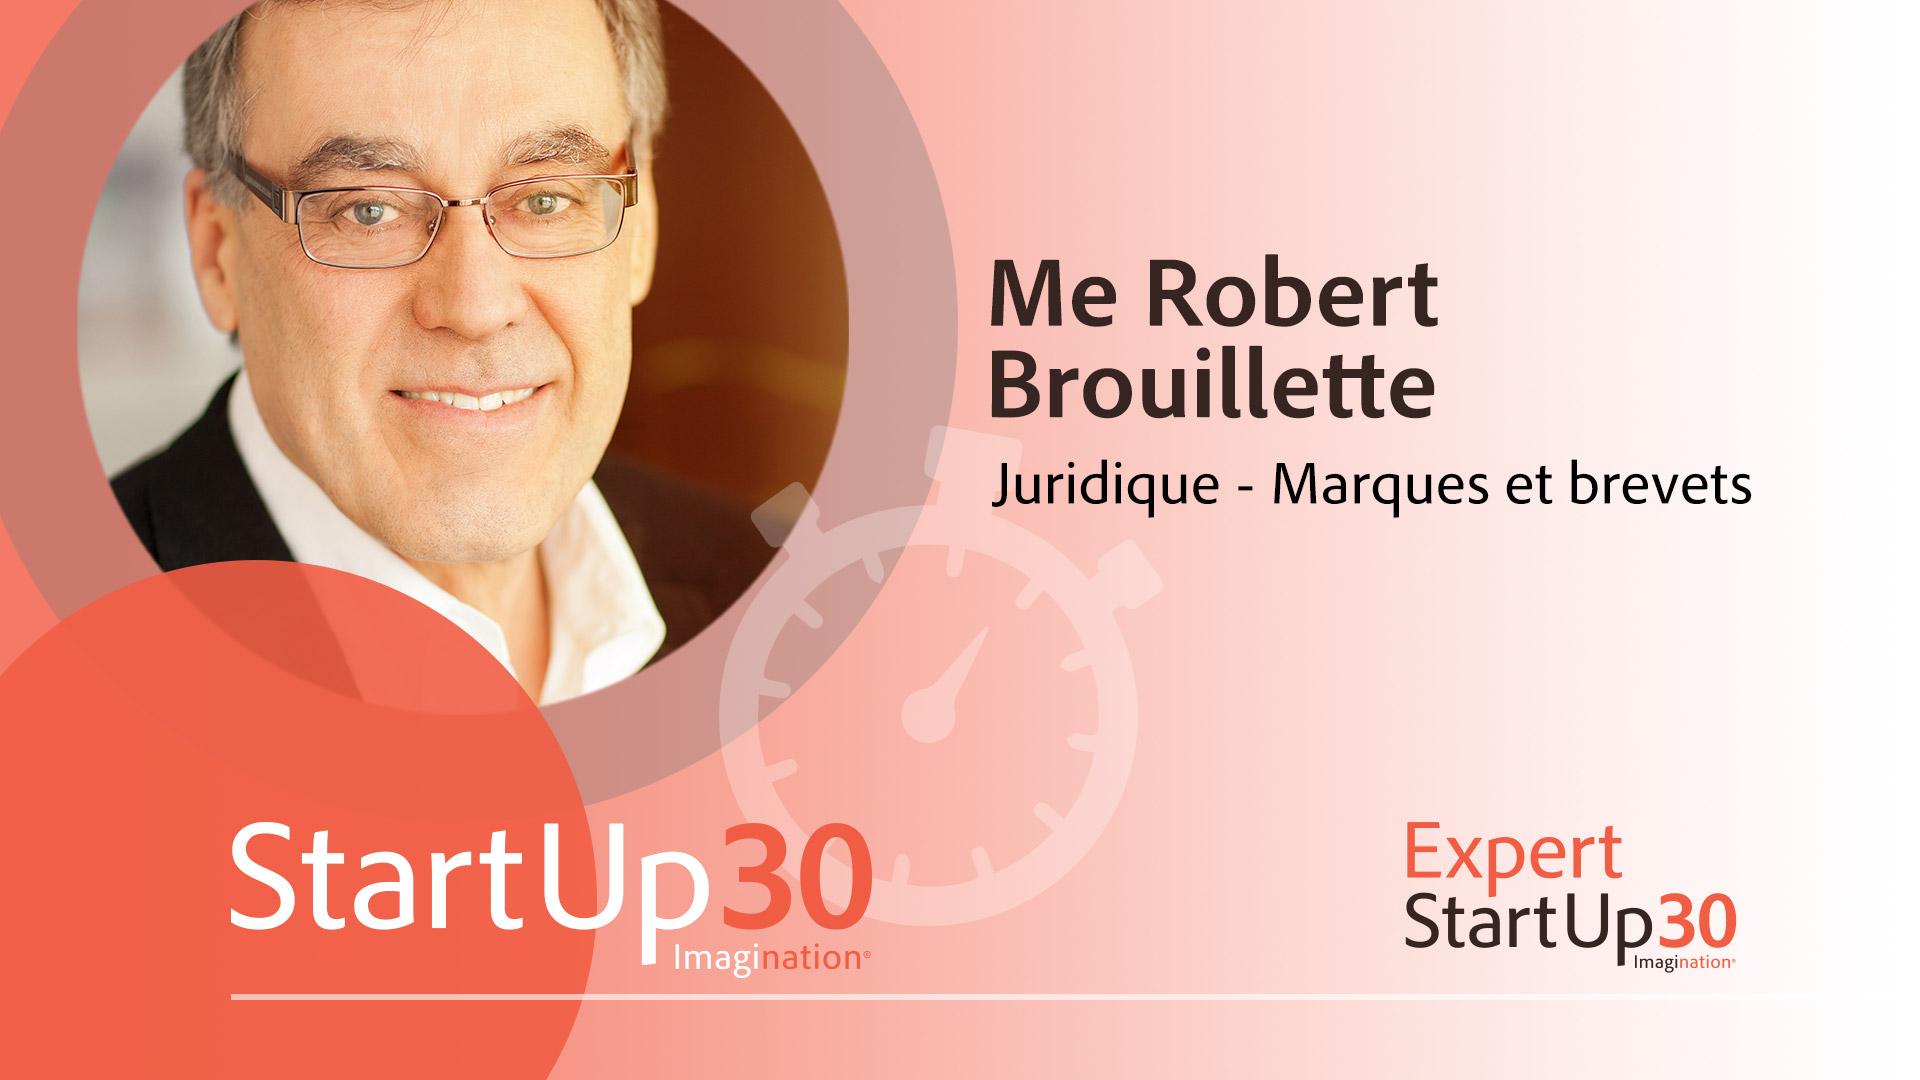 Robert Brouillette - StartUp30